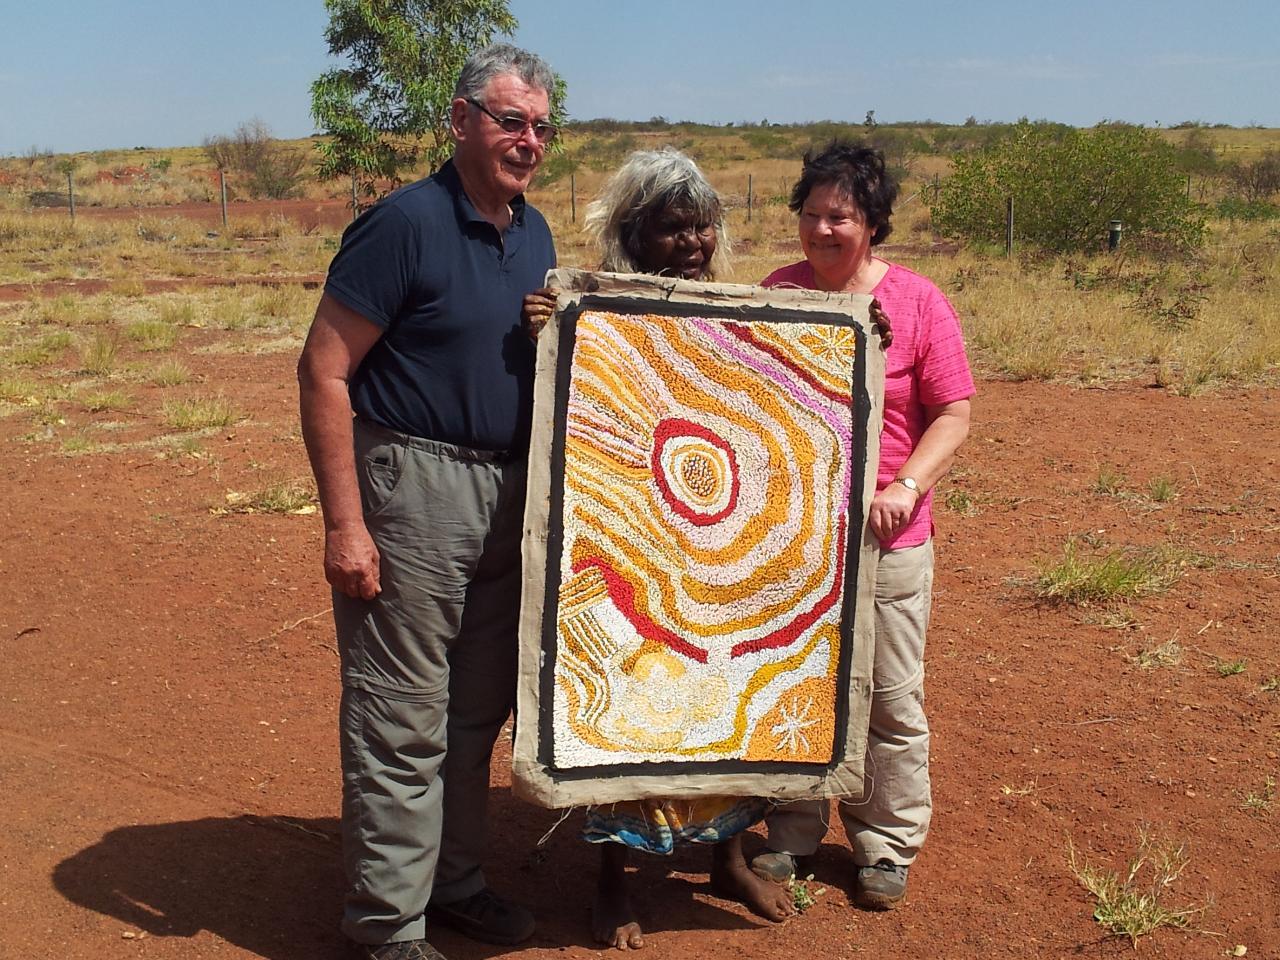 Aboriginal Art Centre Tours  – Western Deserts Tour – From Alice Springs to Uluru 7 days